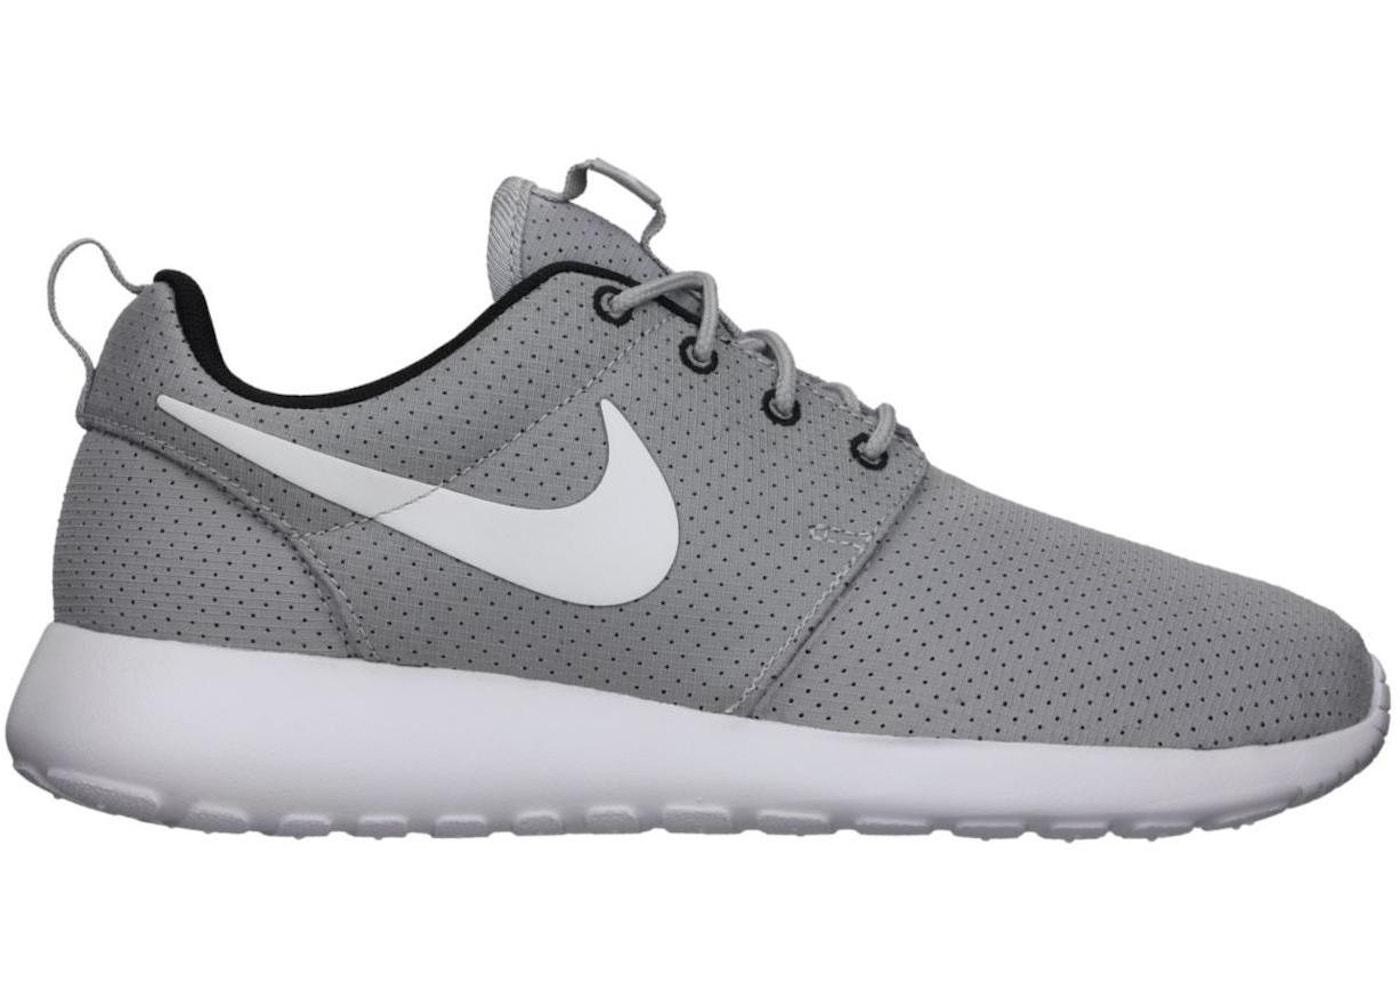 97d329c1da25 Nike Roshe Run Wolf Grey White (GS) - 511882-091